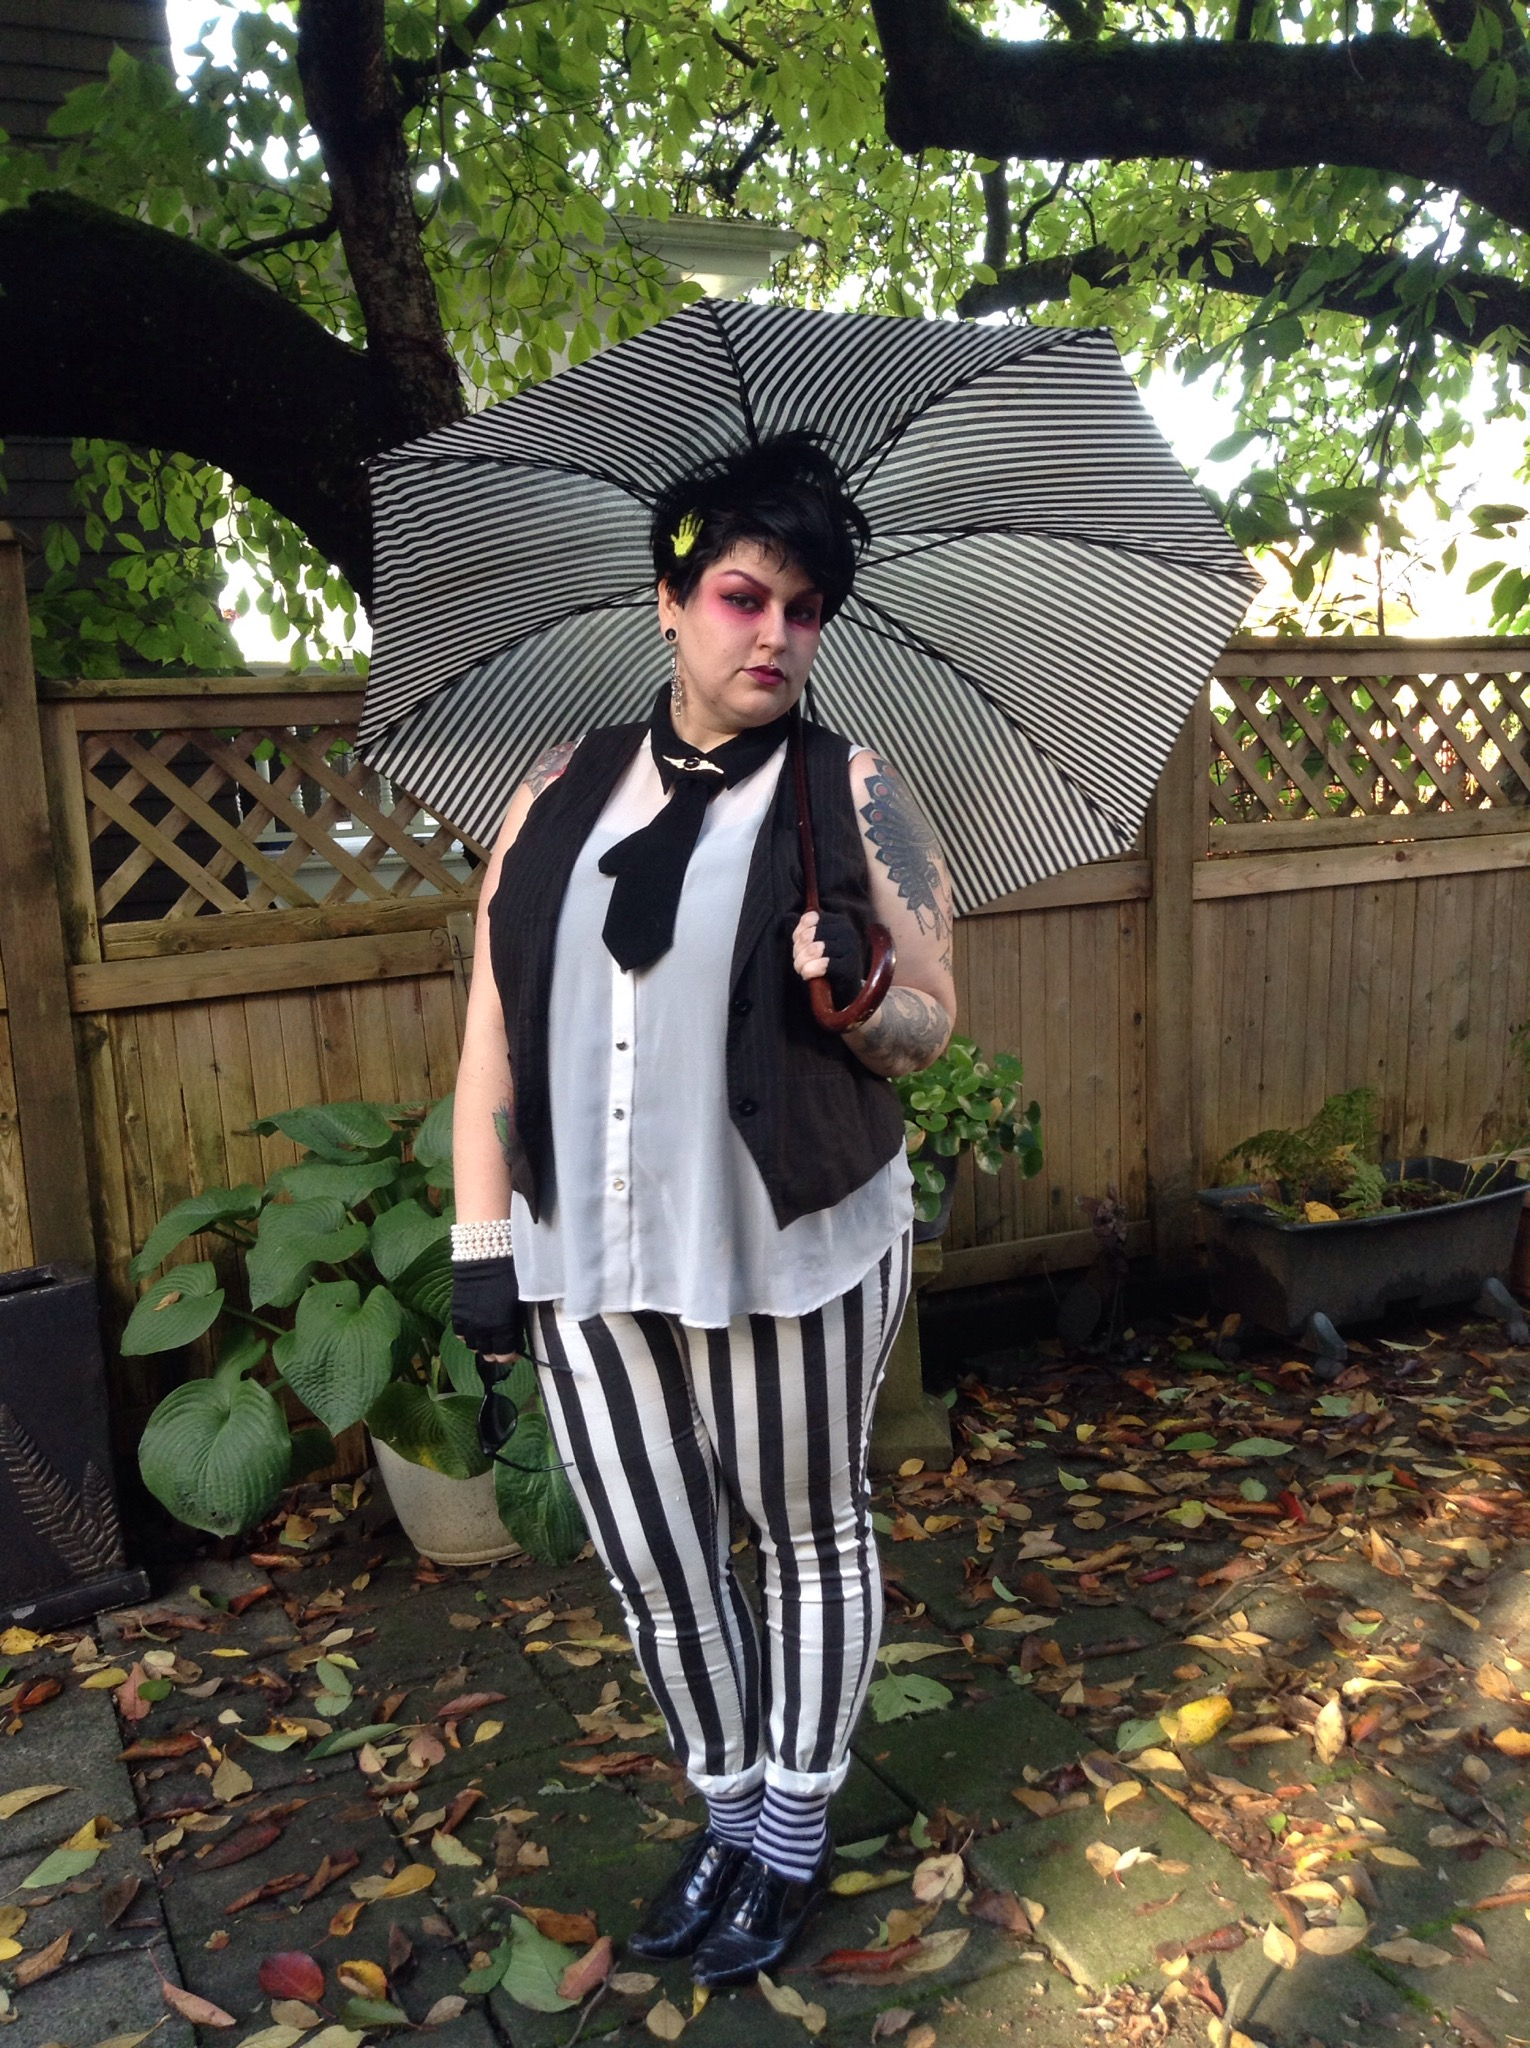 alternative plus size blogger Margot Meanie dressed as Beetlejuice // margotmeanie.com